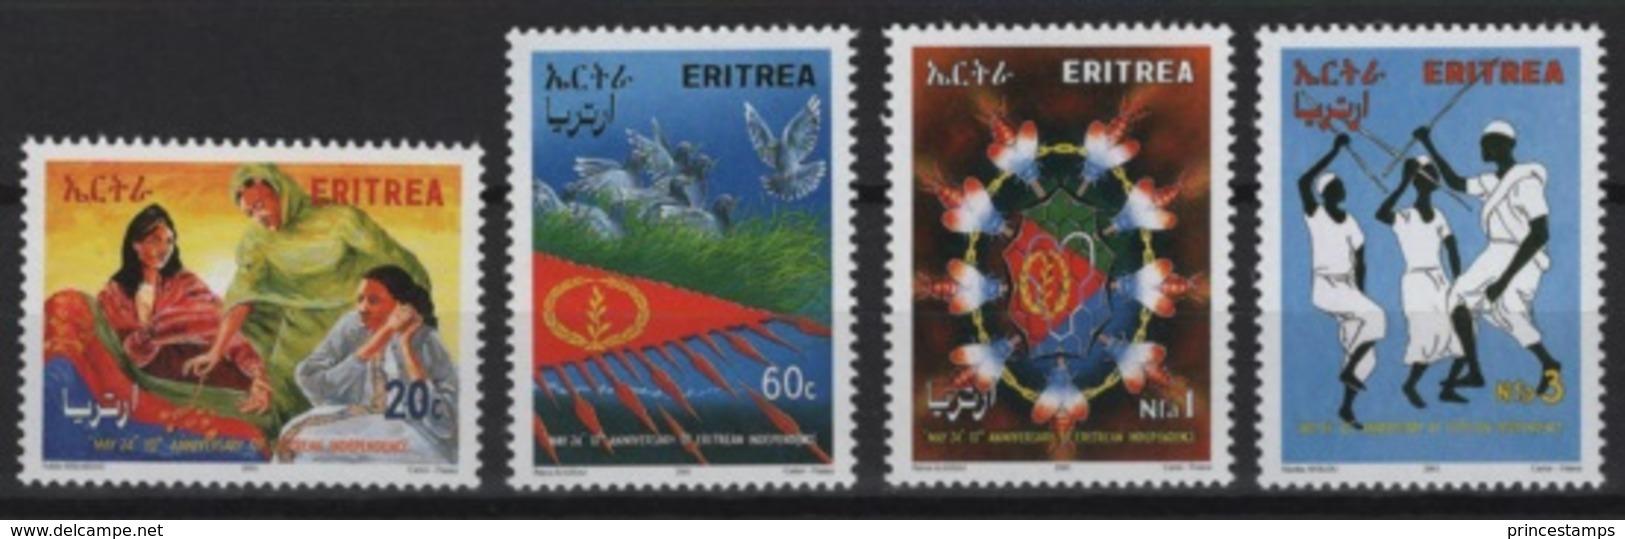 Eritrea (2001) Yv. 429/32  /  Independency - Independance - Flags - Culture - Dances - Dress - Eritrea